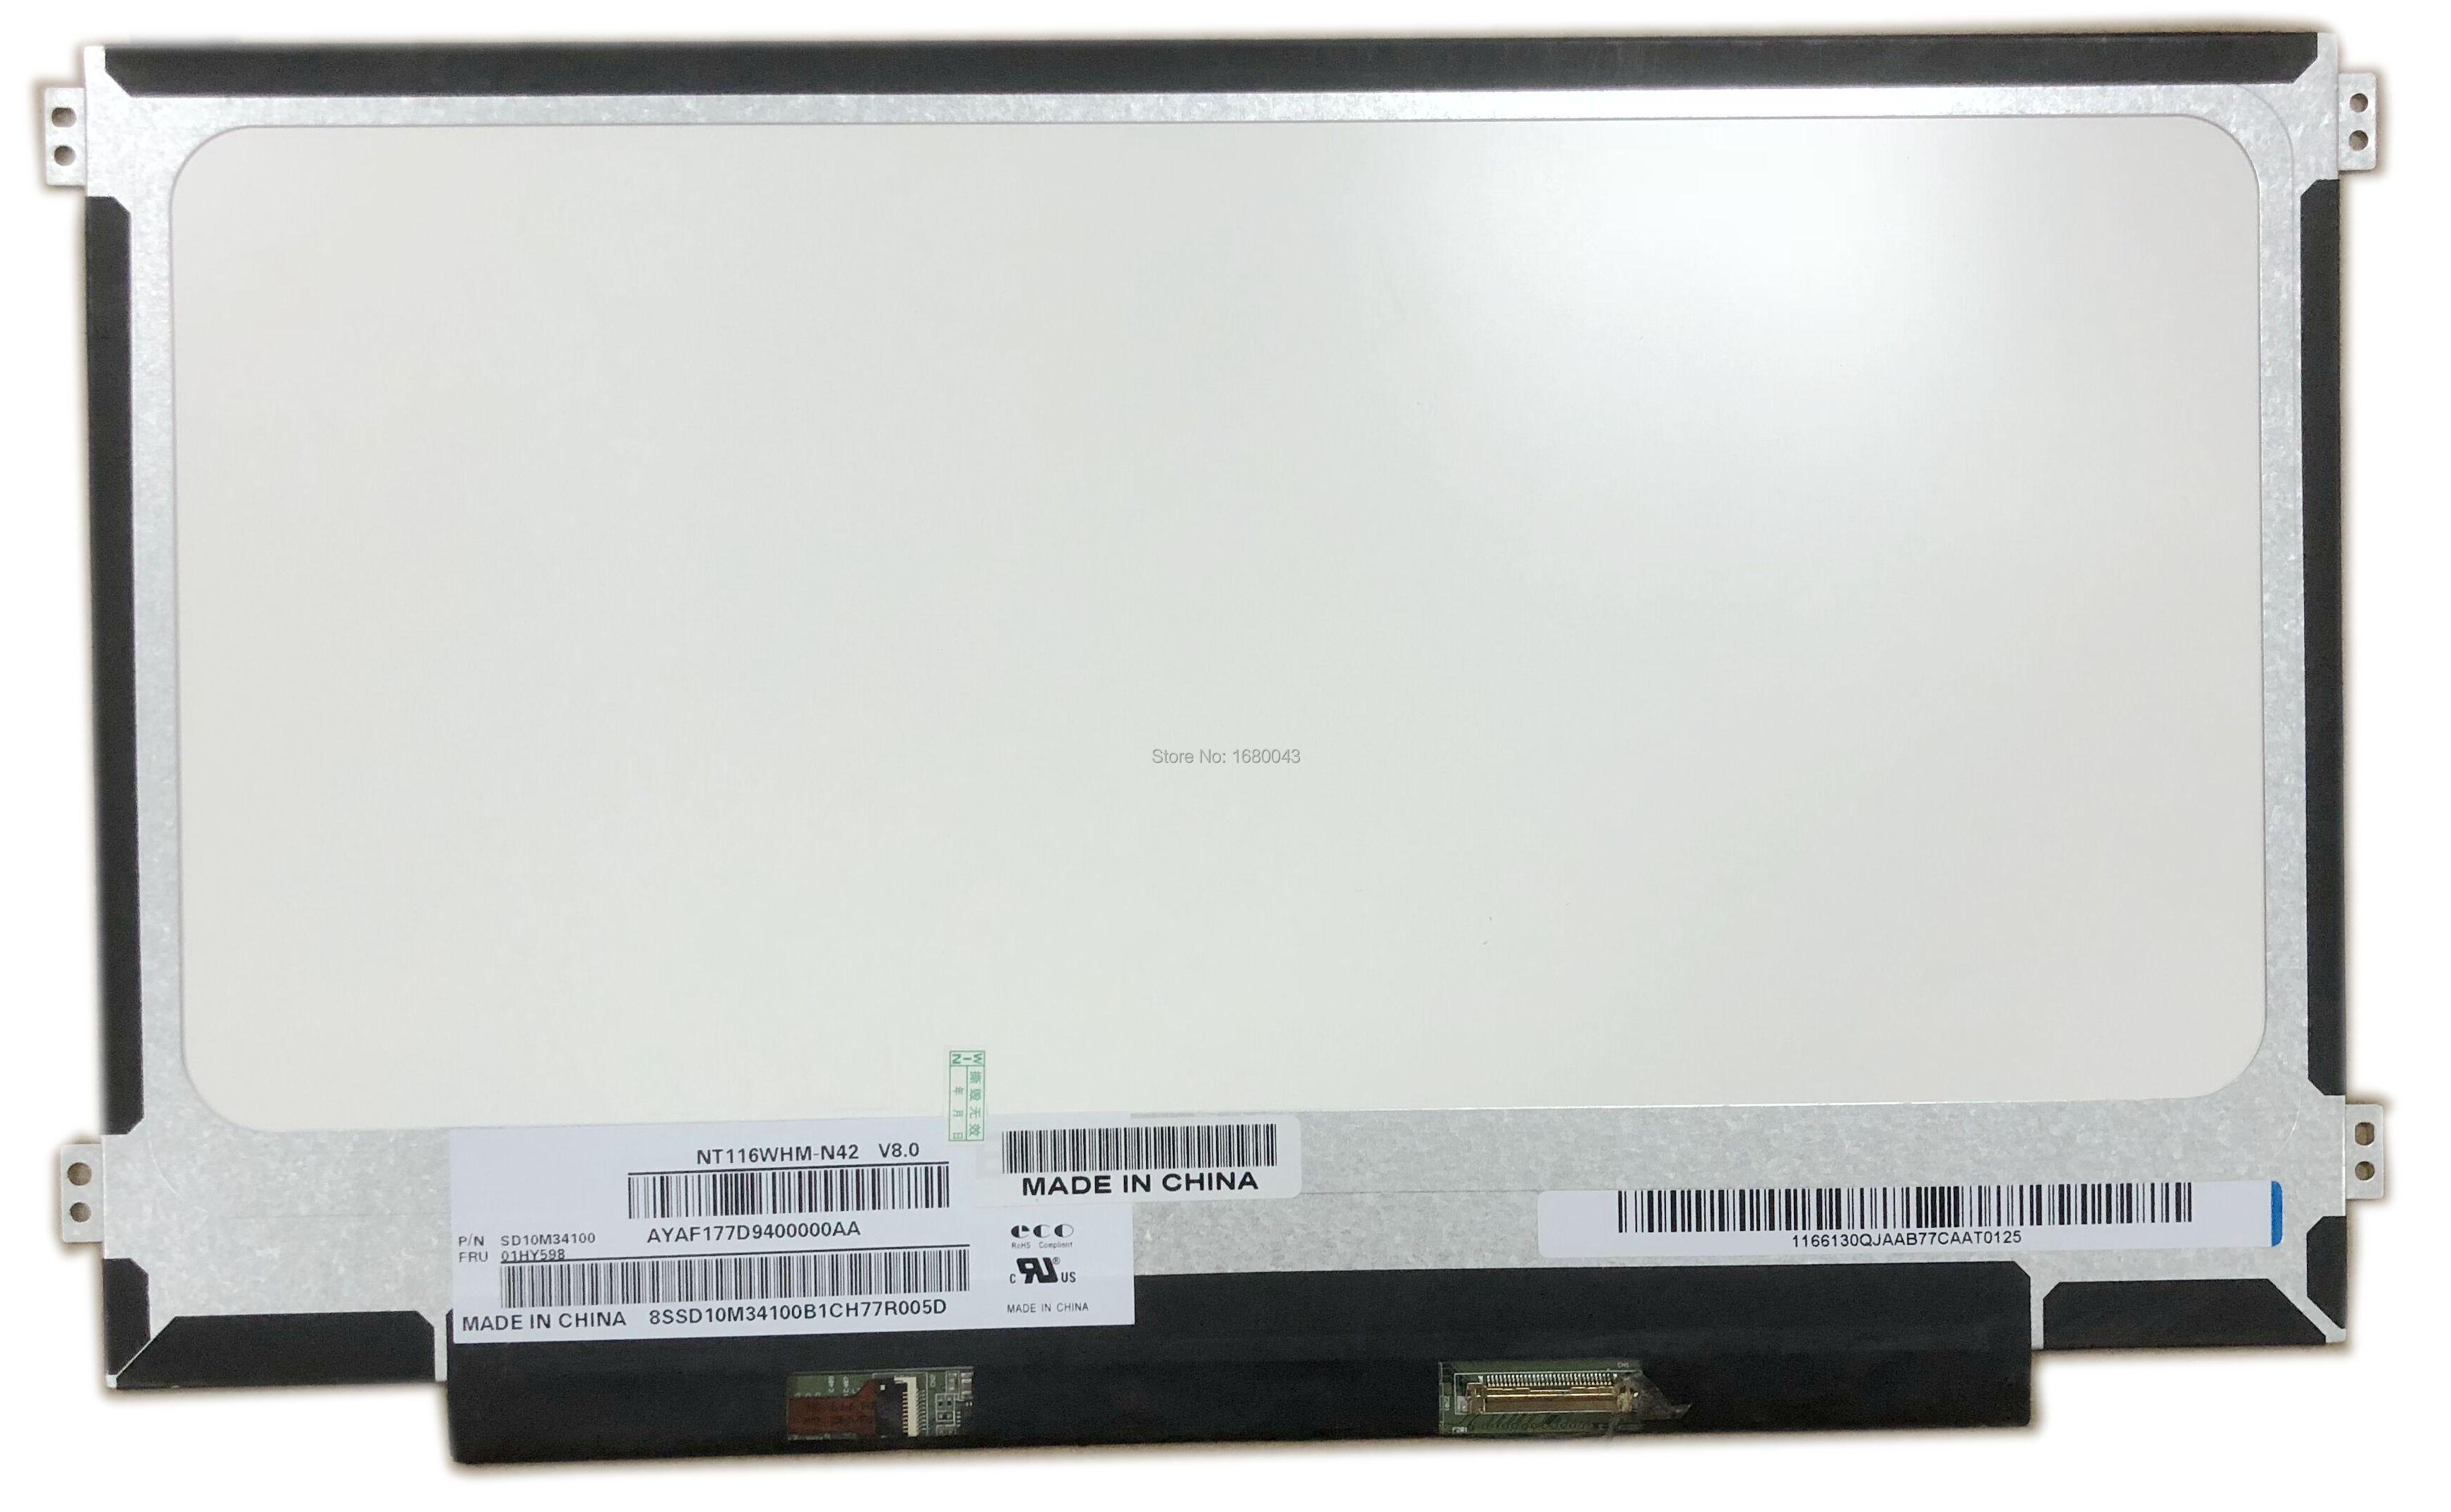 NT116WHM-N42 N12 fit B116XTN02.3 B116XTN02.1 N116BGE-EA1 N116BGE-EB2 N116BGE-EA2 M116NWR1 R7 LED LCD Screen Panel 30PIN eDPNT116WHM-N42 N12 fit B116XTN02.3 B116XTN02.1 N116BGE-EA1 N116BGE-EB2 N116BGE-EA2 M116NWR1 R7 LED LCD Screen Panel 30PIN eDP